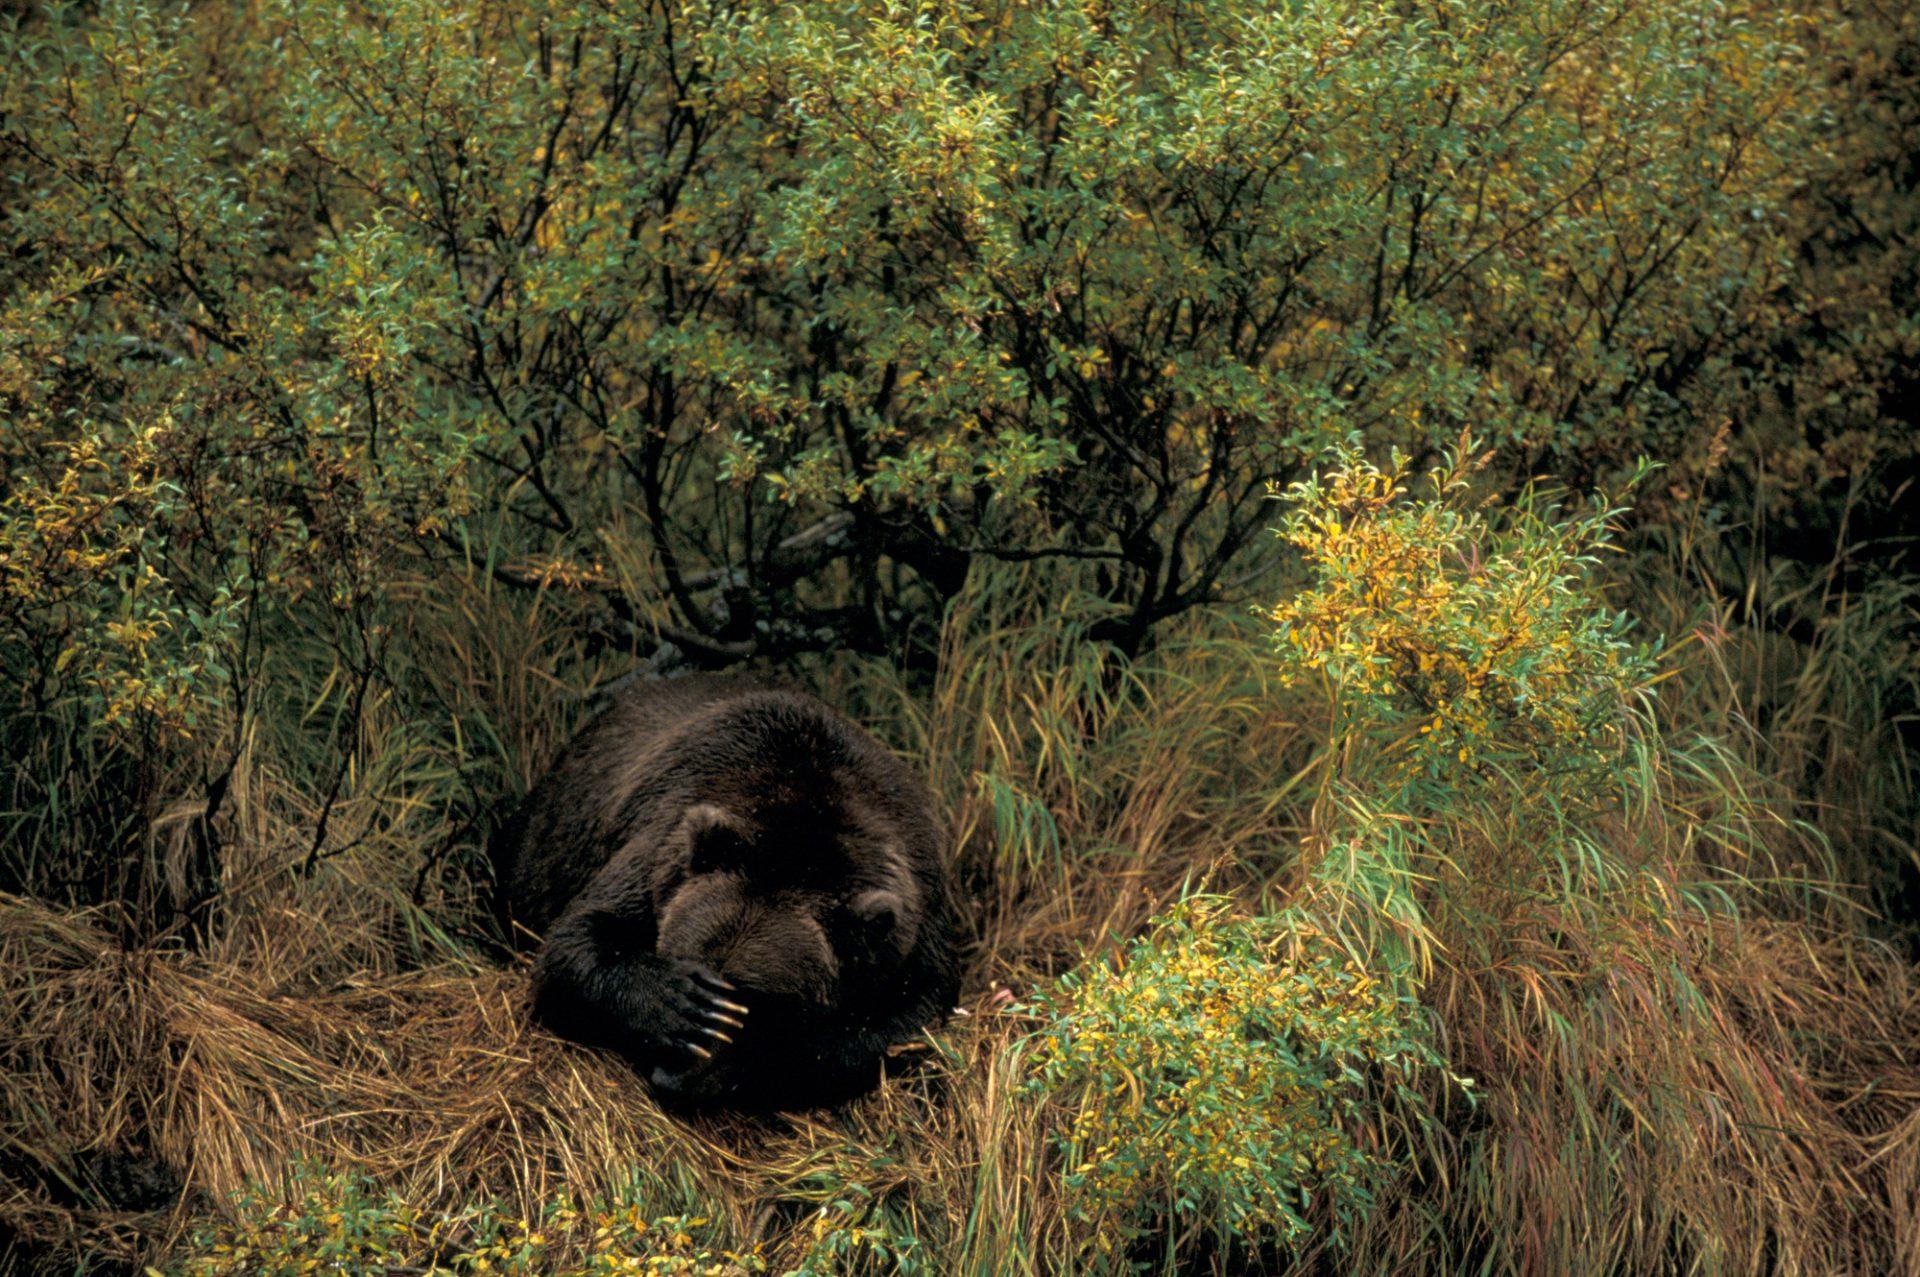 Photo: A grizzly bear dozes after fishing in Katmai, Alaska.